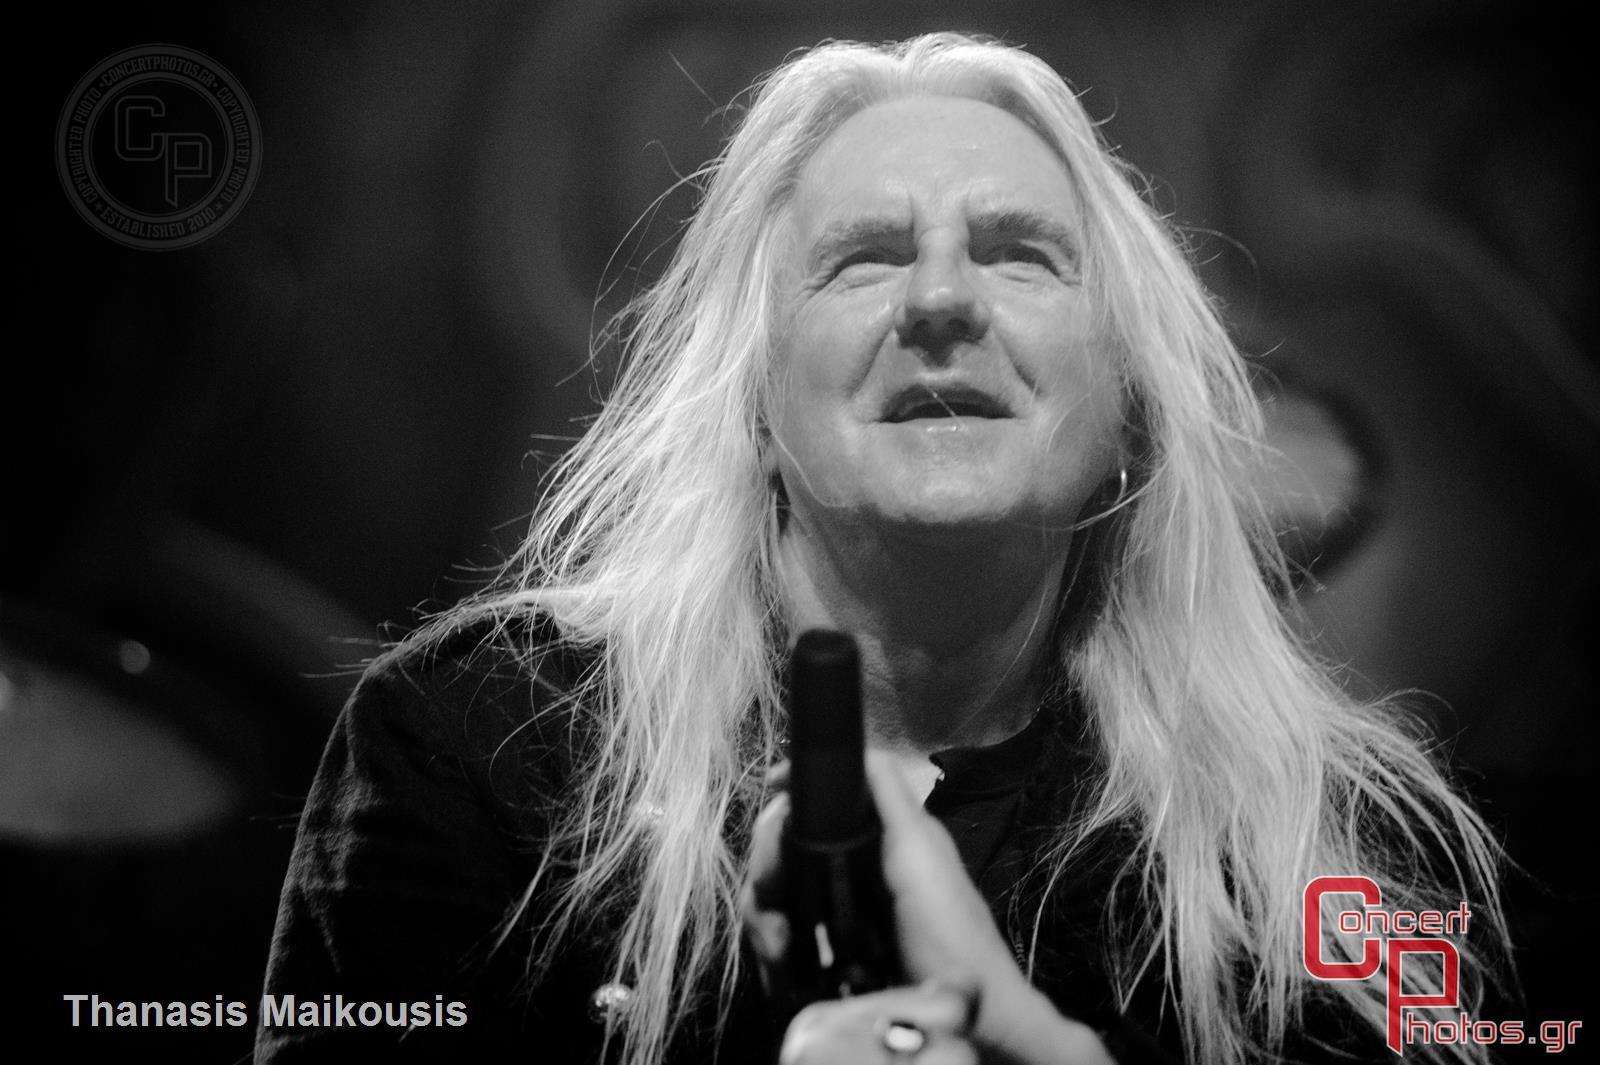 Saxon & Innerwish -Saxon Innerwish Gagarin photographer: Thanasis Maikousis - concertphotos_20141025_22_35_53